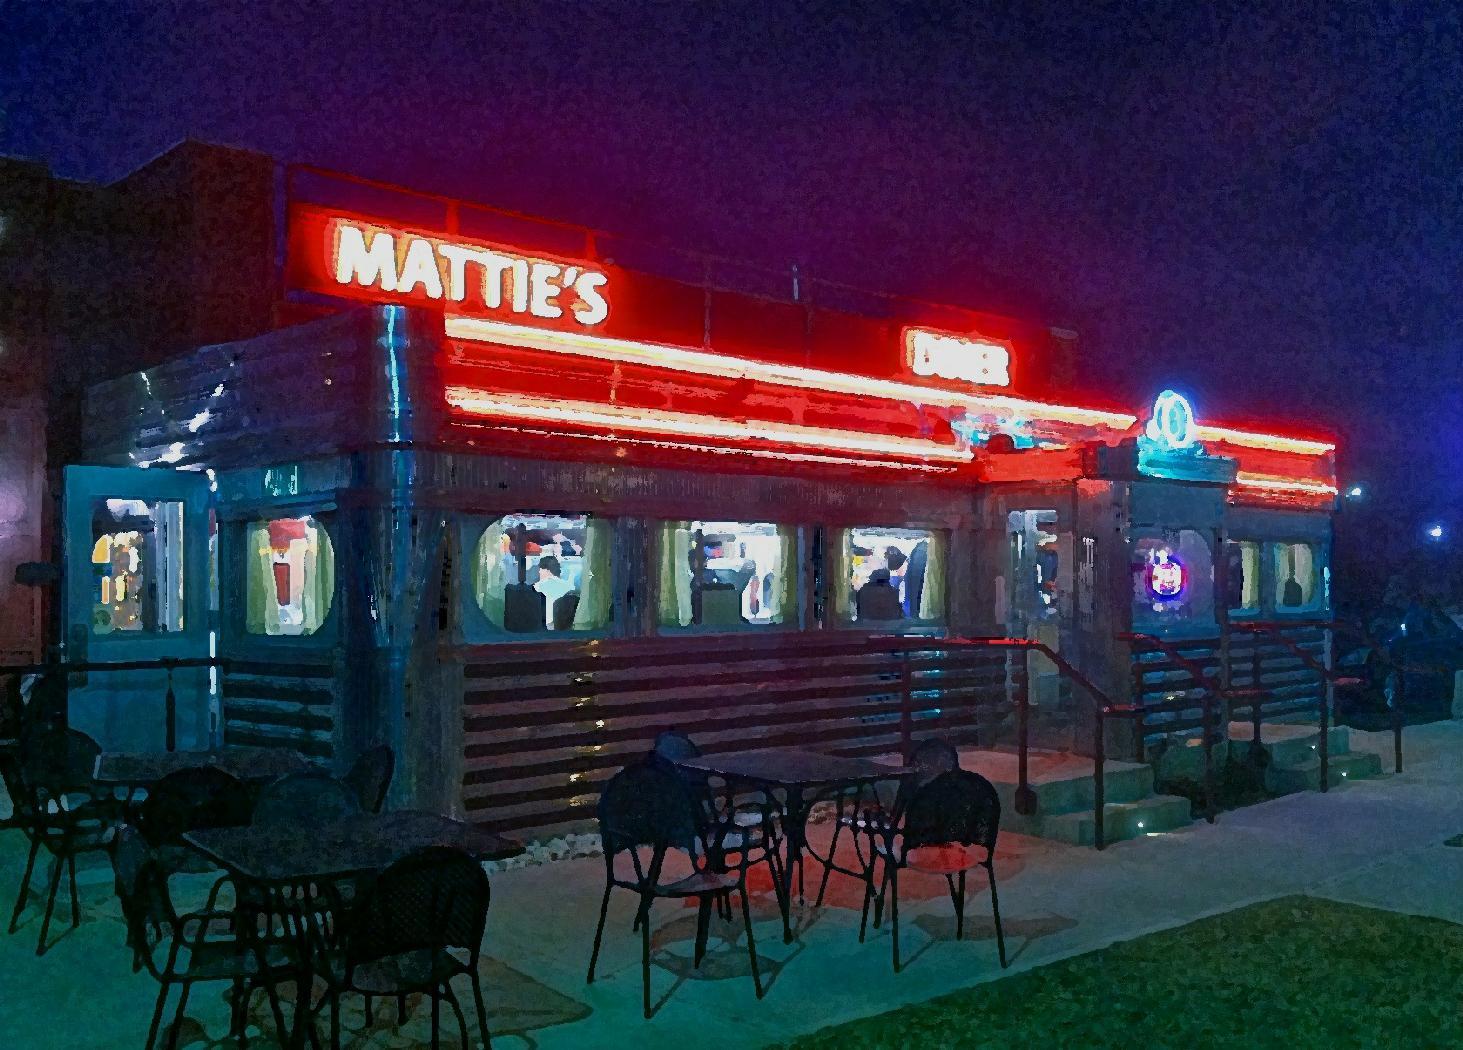 Mattie's Diner